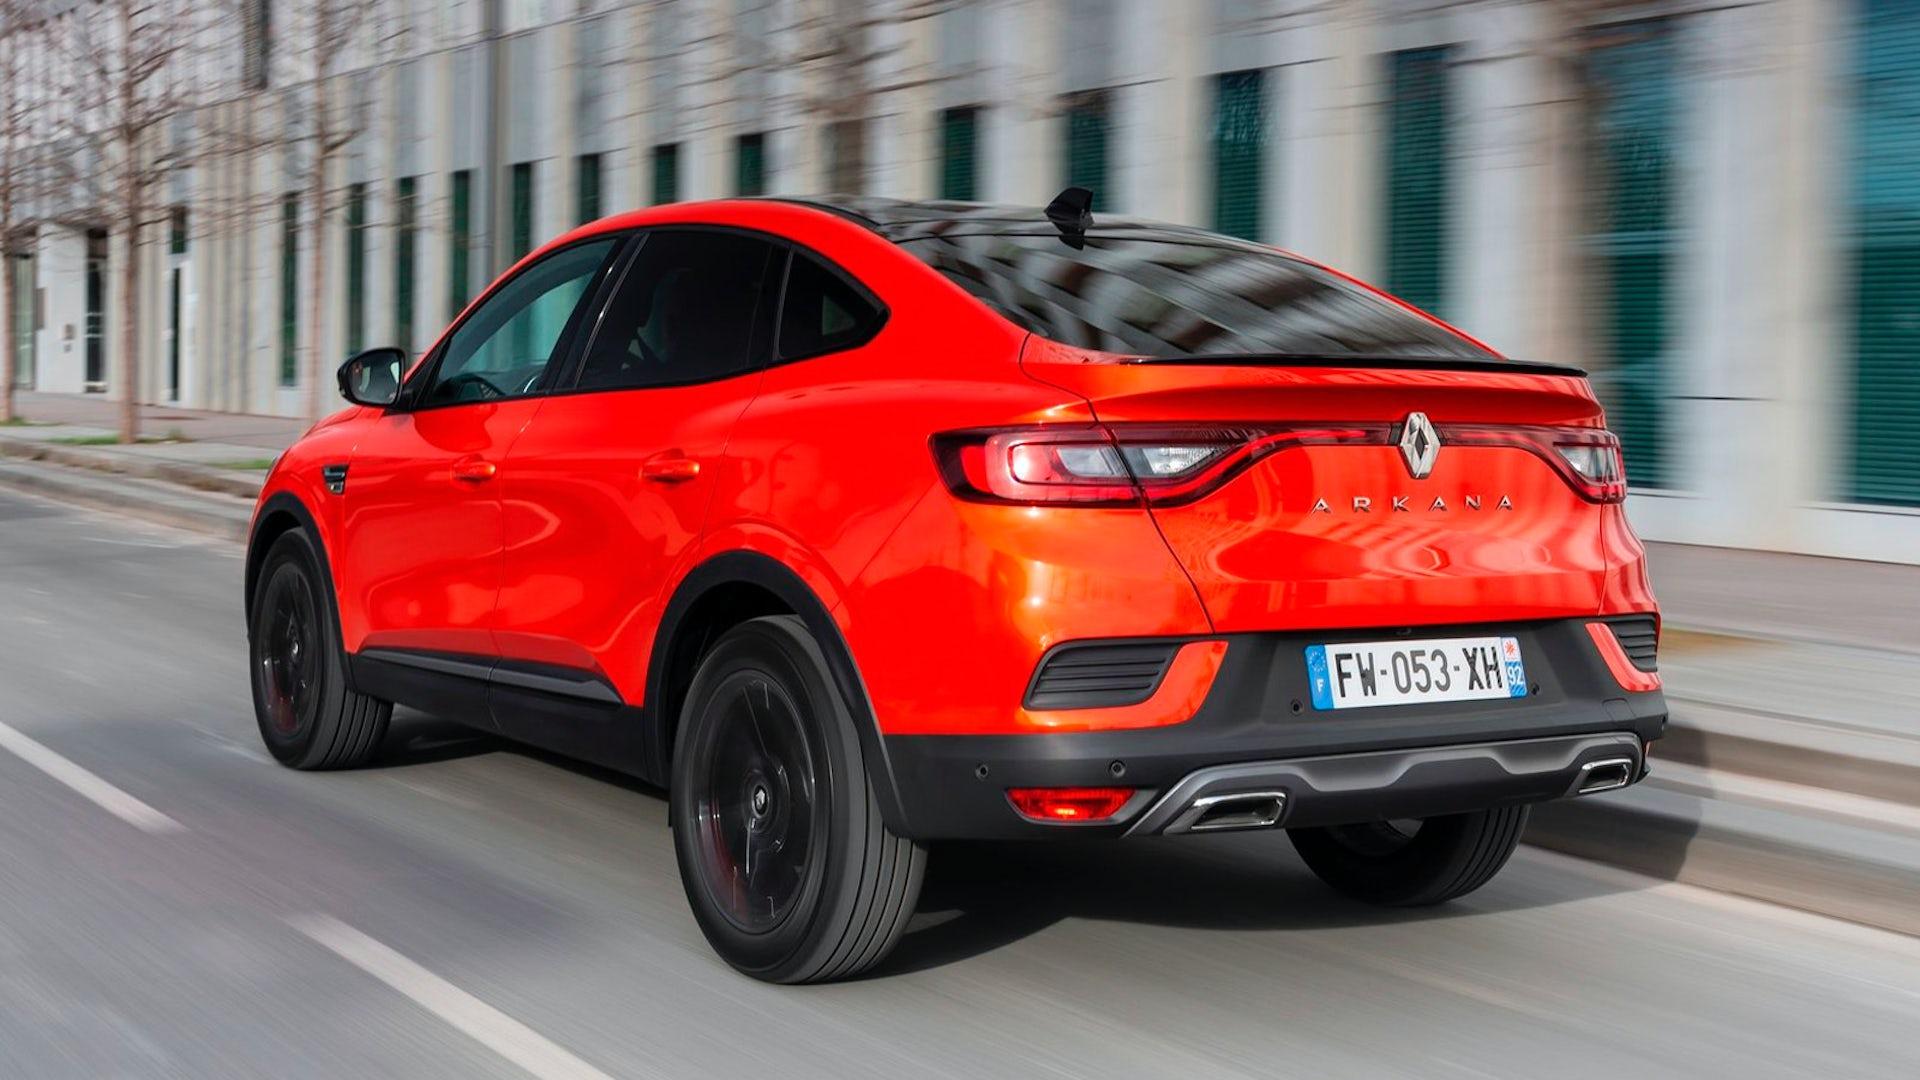 Renault Arkana | Dealer On Fire